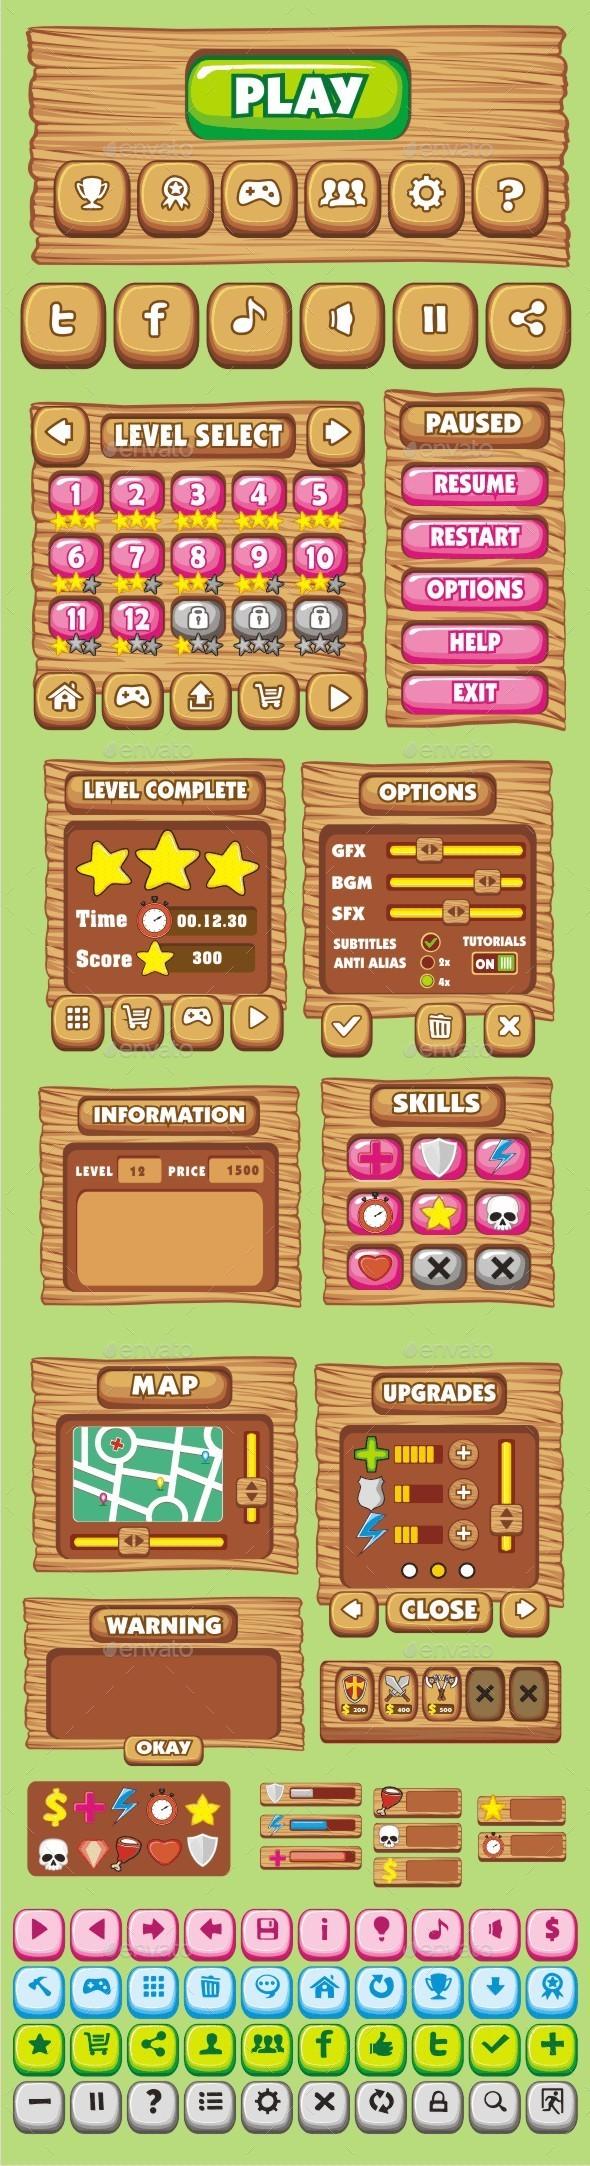 GraphicRiver cartoon game gui pack 10 10548312